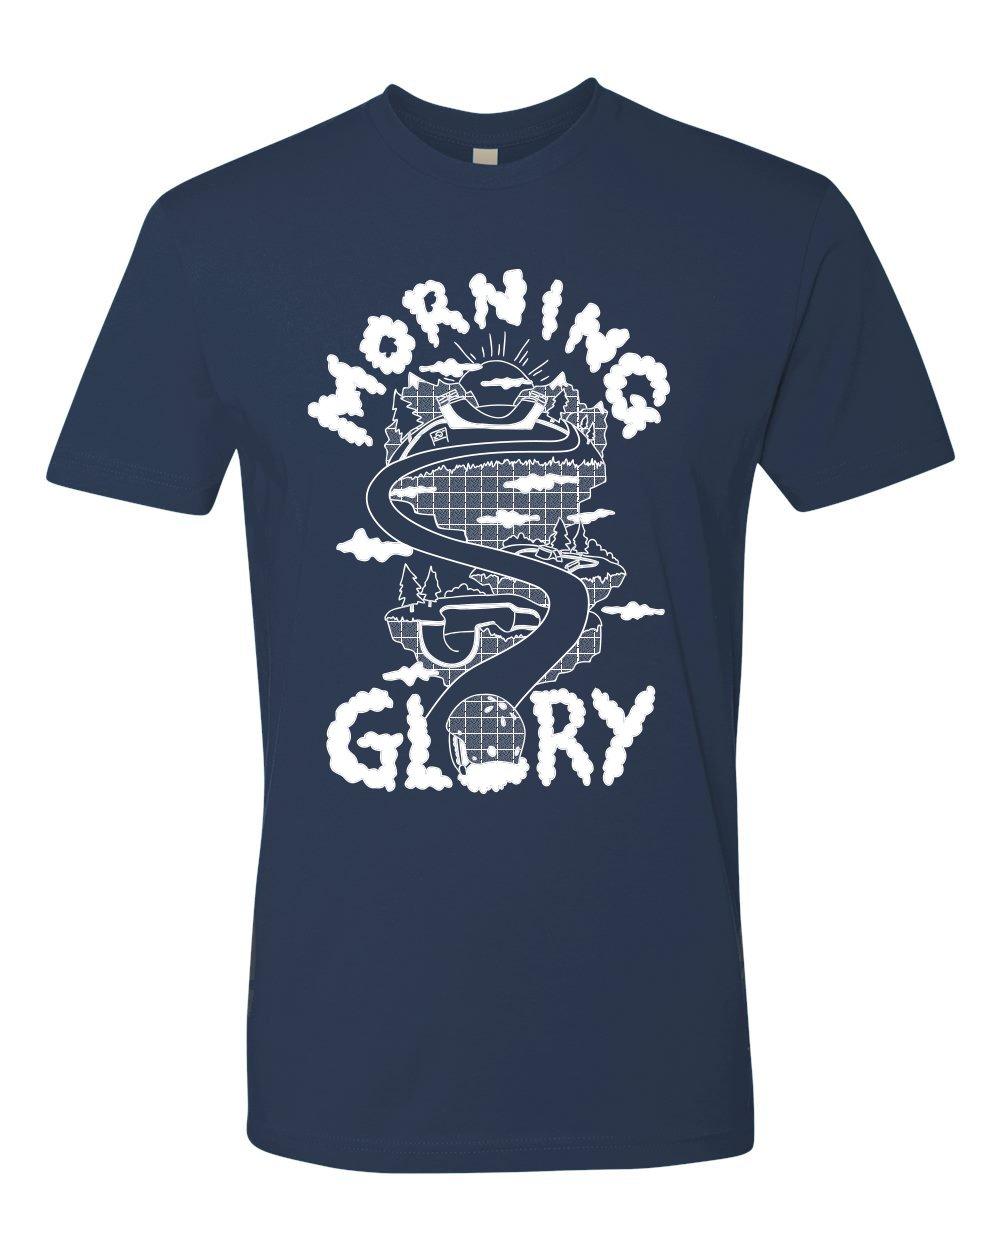 Morning Glory (Tee)